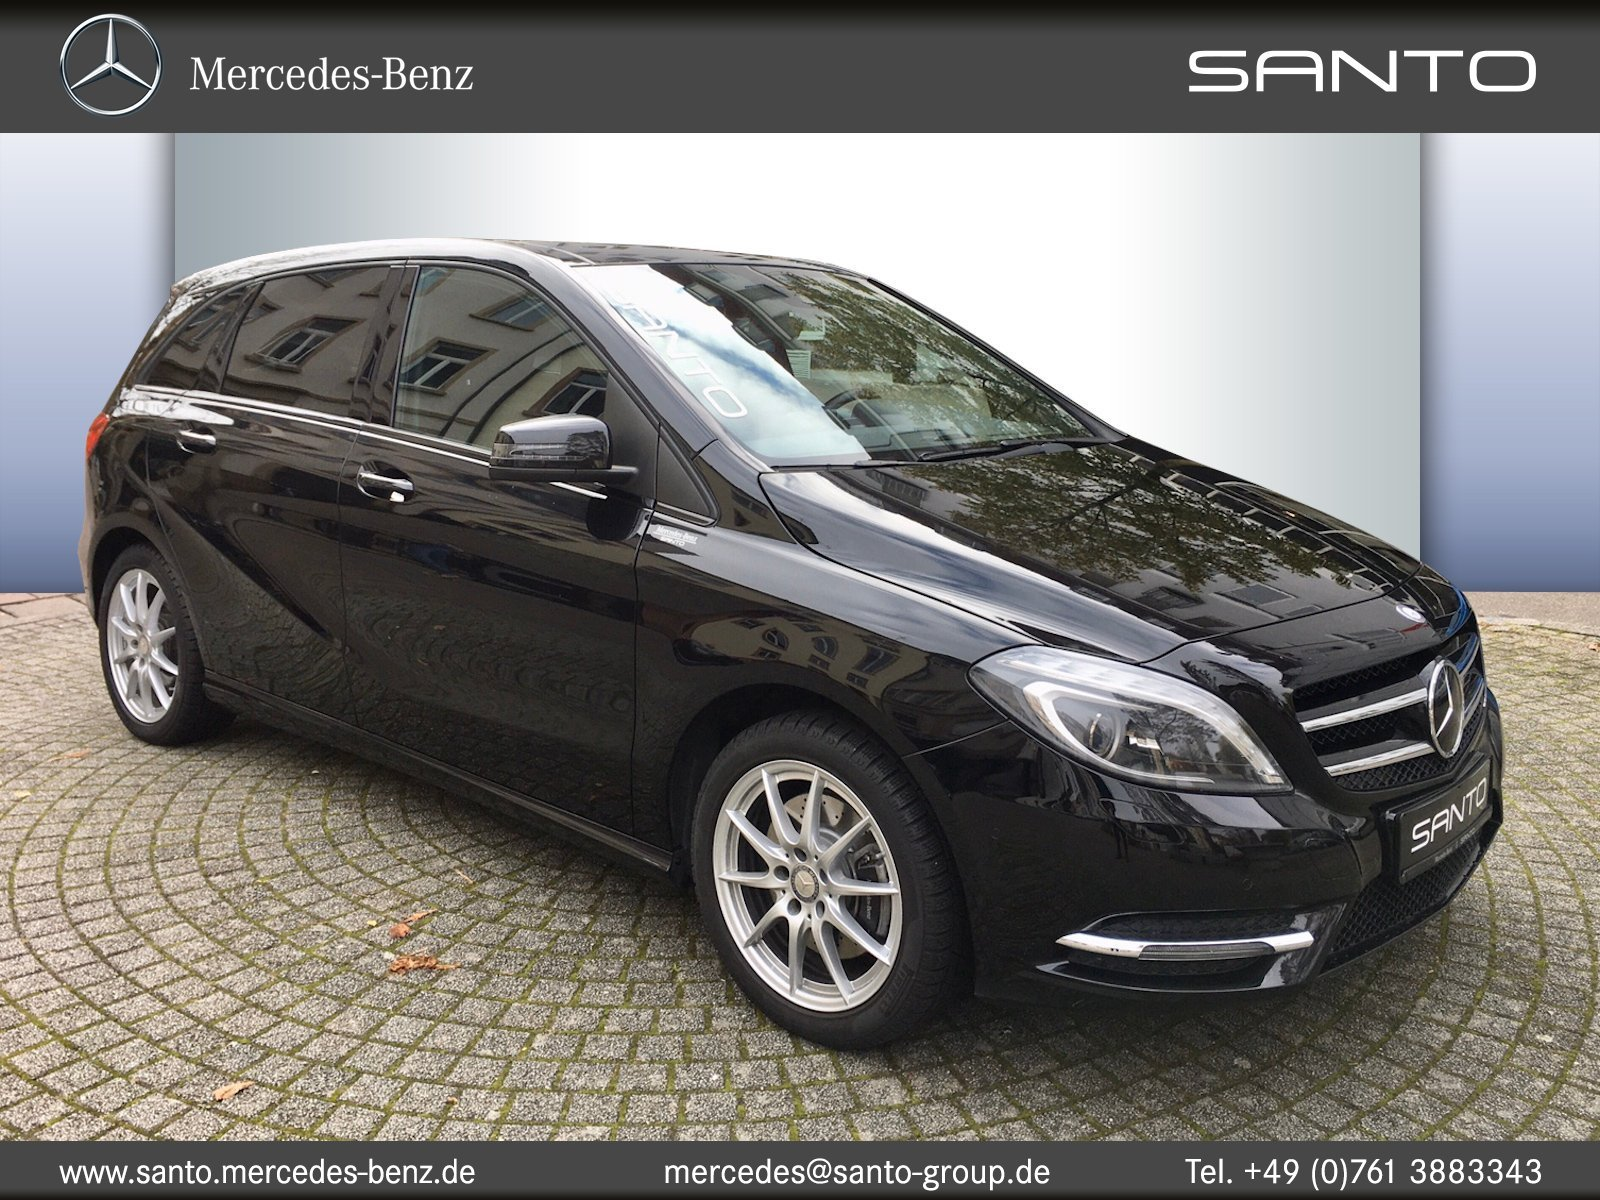 Mercedes-Benz B 250 + 1. HAND + AUTOMATIK + PANORAMA + LEDER, Jahr 2014, petrol